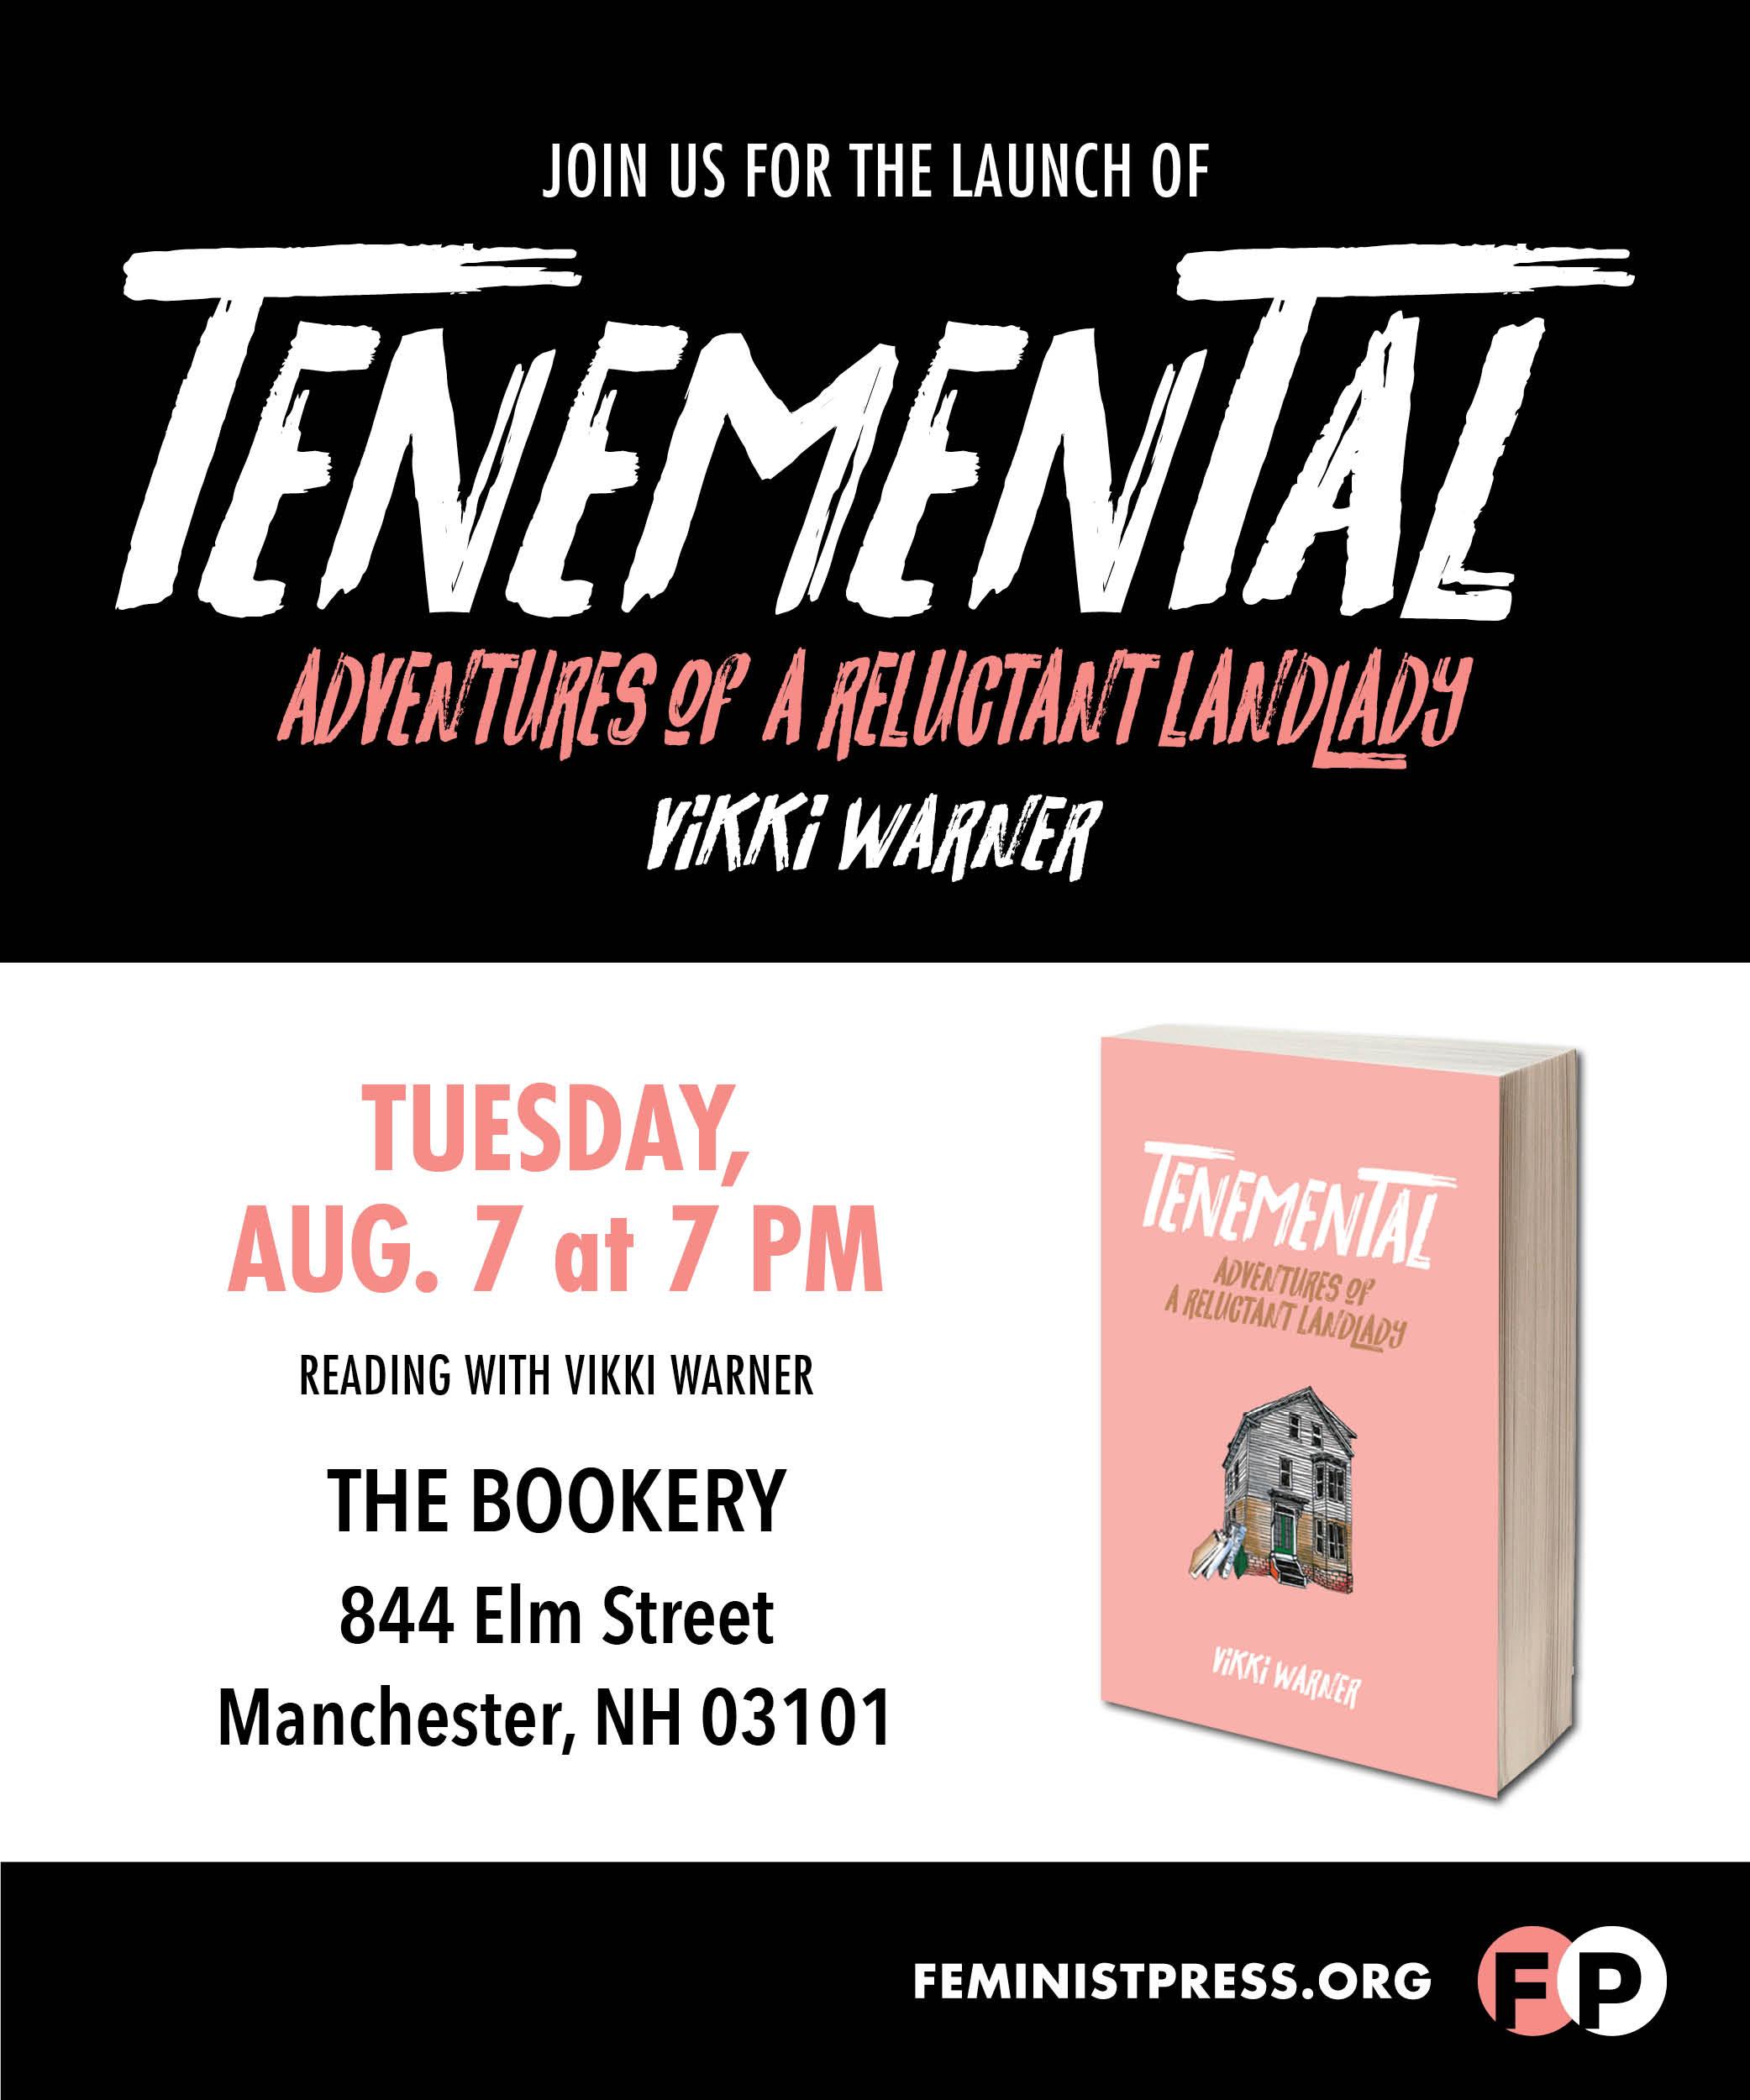 TENEMENTAL_Event_eblast_BOOKERY.jpg